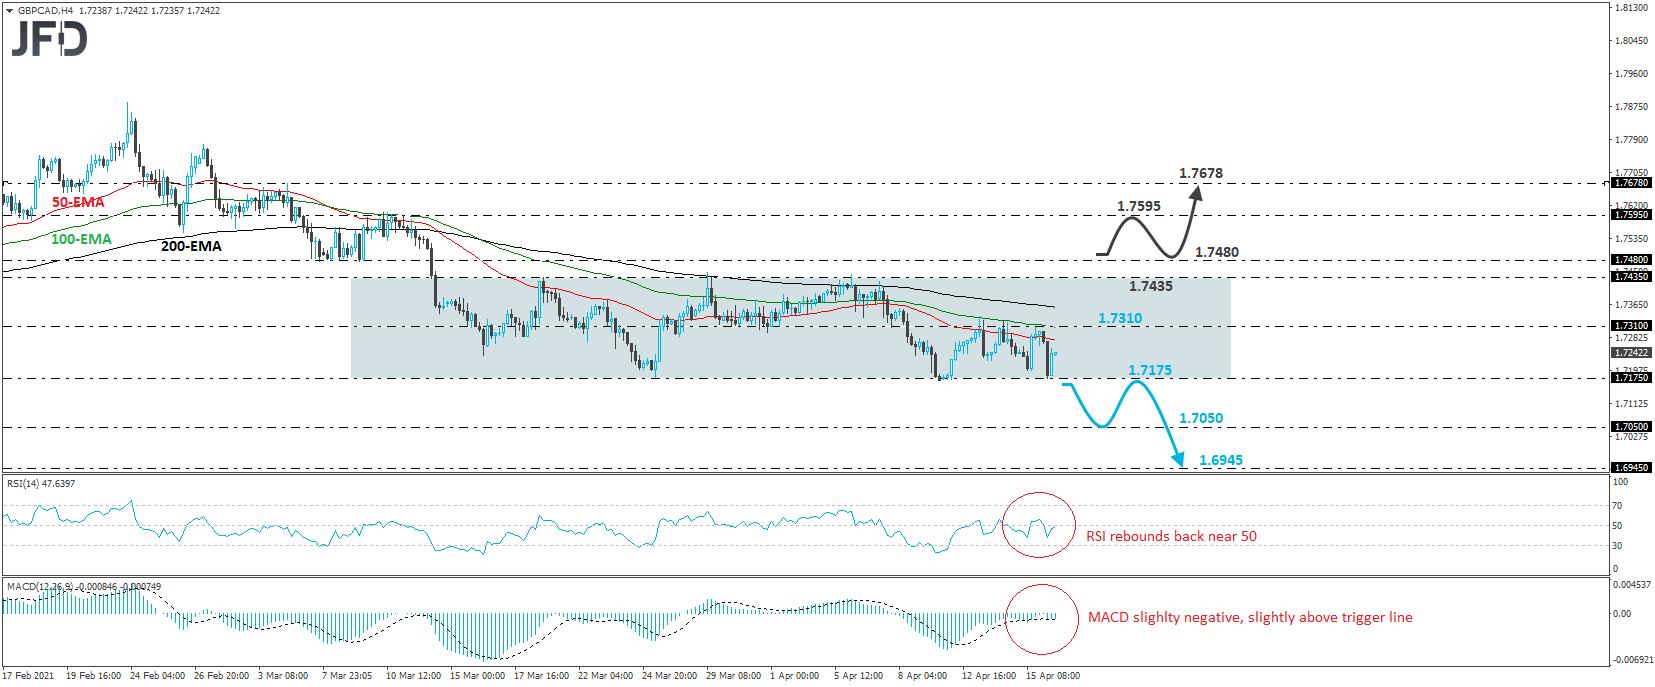 GBP/CAD Trades Within A Sideways Range